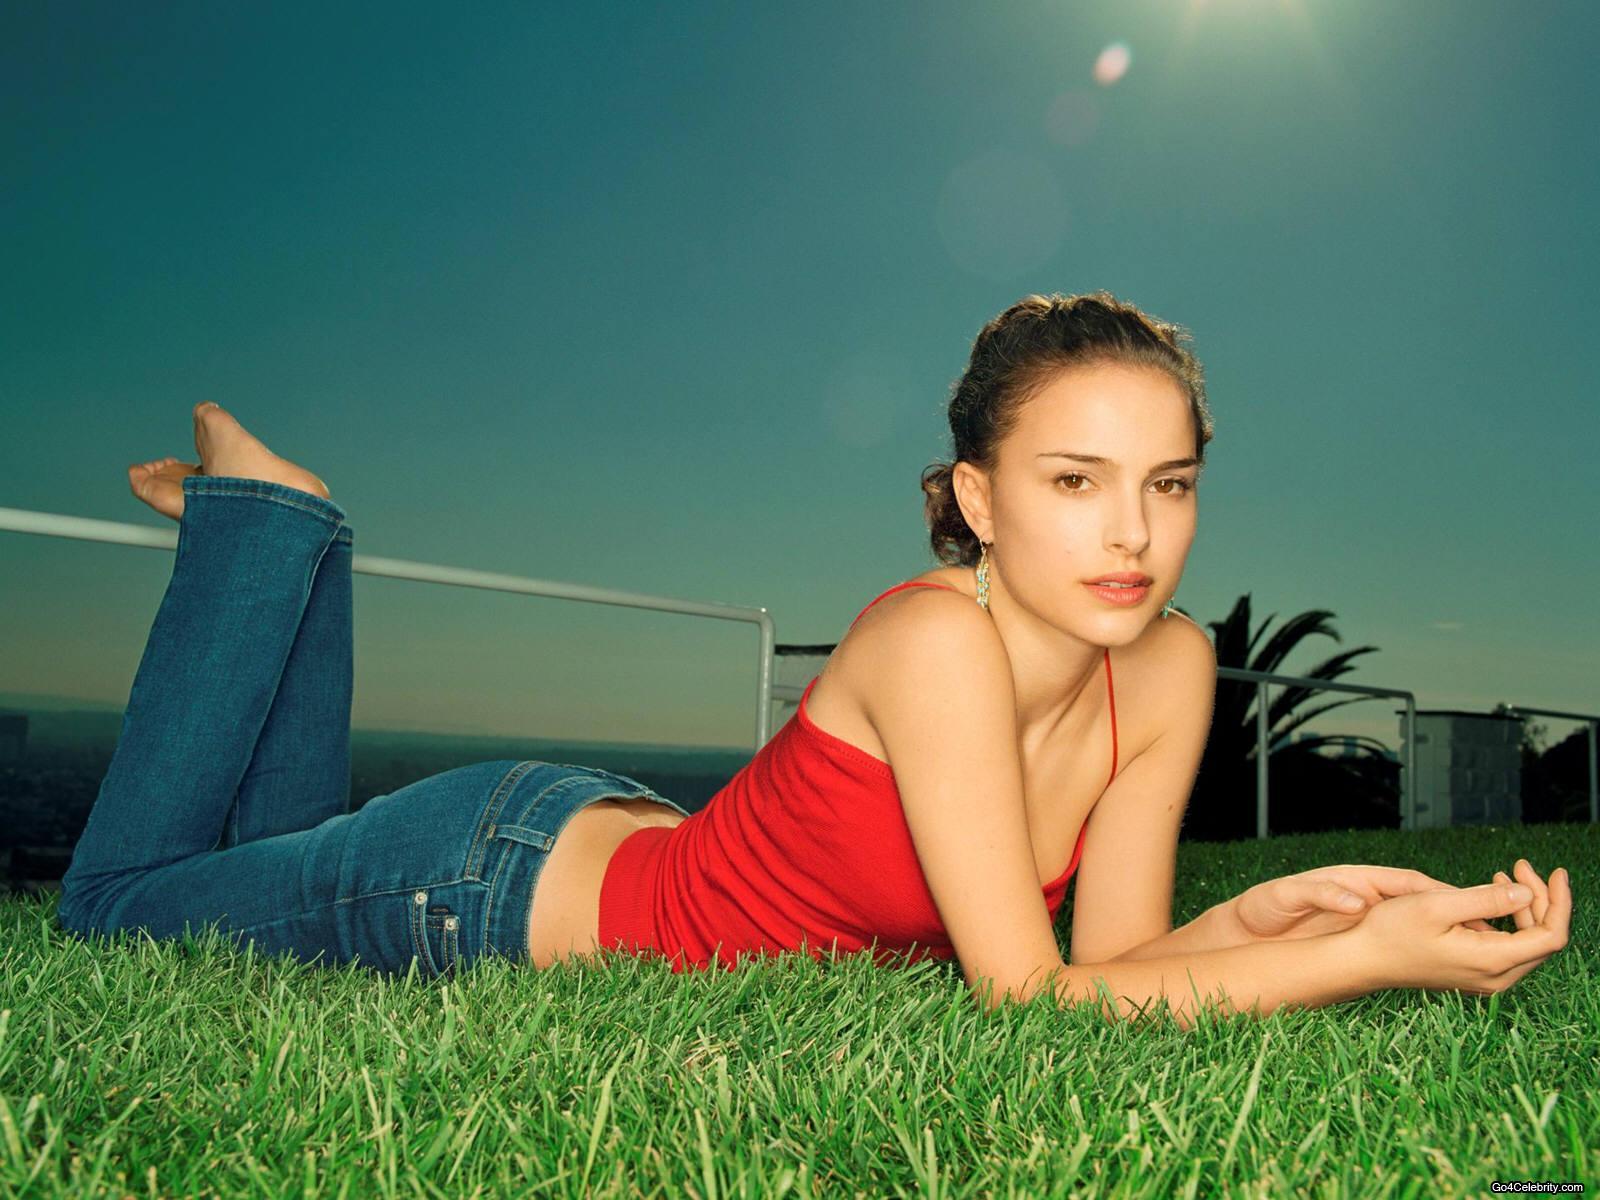 http://4.bp.blogspot.com/--ui_GE0gvuI/Ti2NSq7sS5I/AAAAAAAAAOA/mwWutpcvtbc/s1600/Natalie-Portman-100.jpg